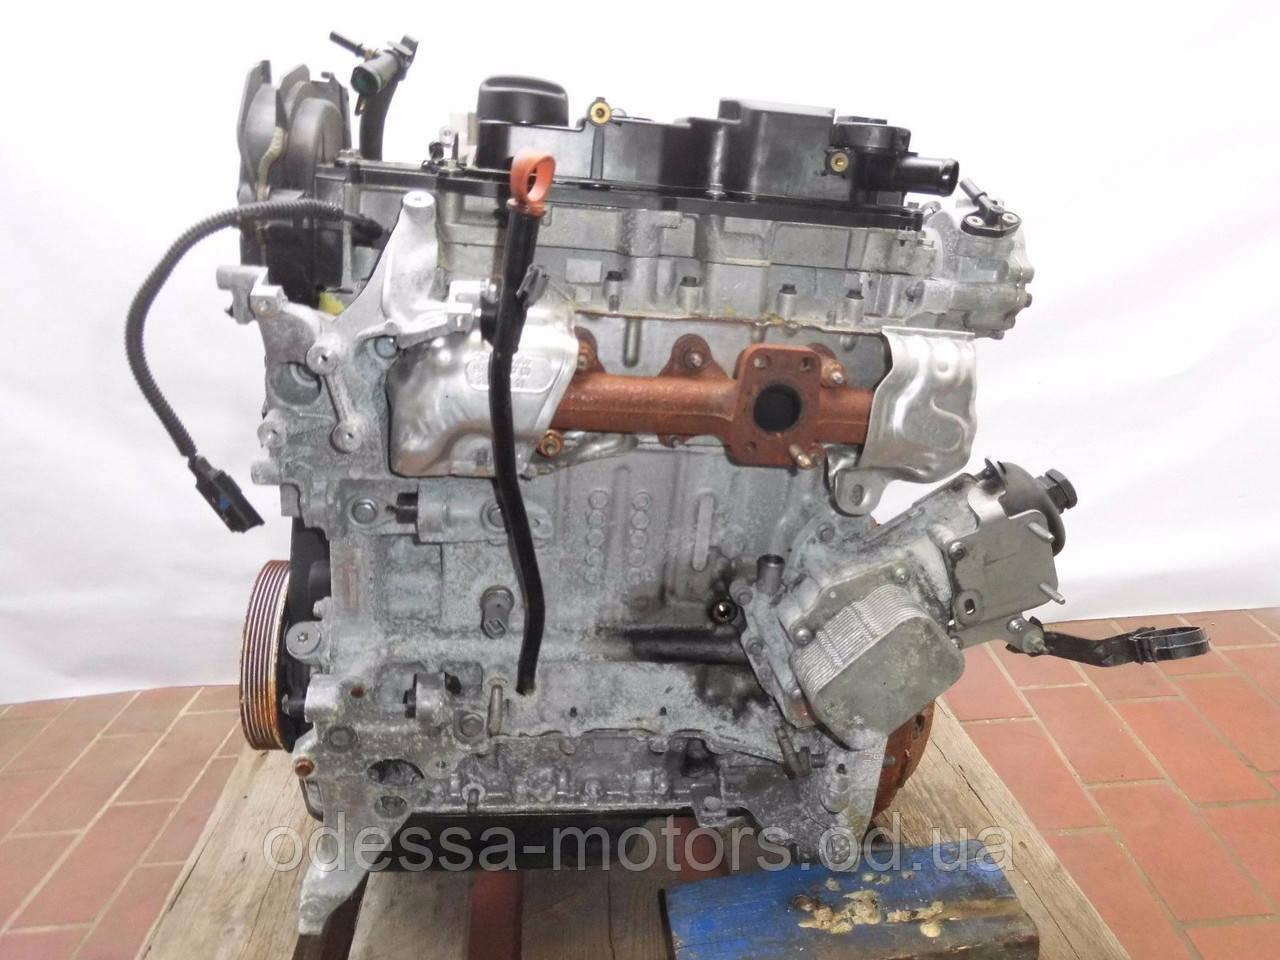 Двигатель Peugeot 208 1.6 HDi, 2012-today тип мотора 9HP (DV6DTED), фото 1